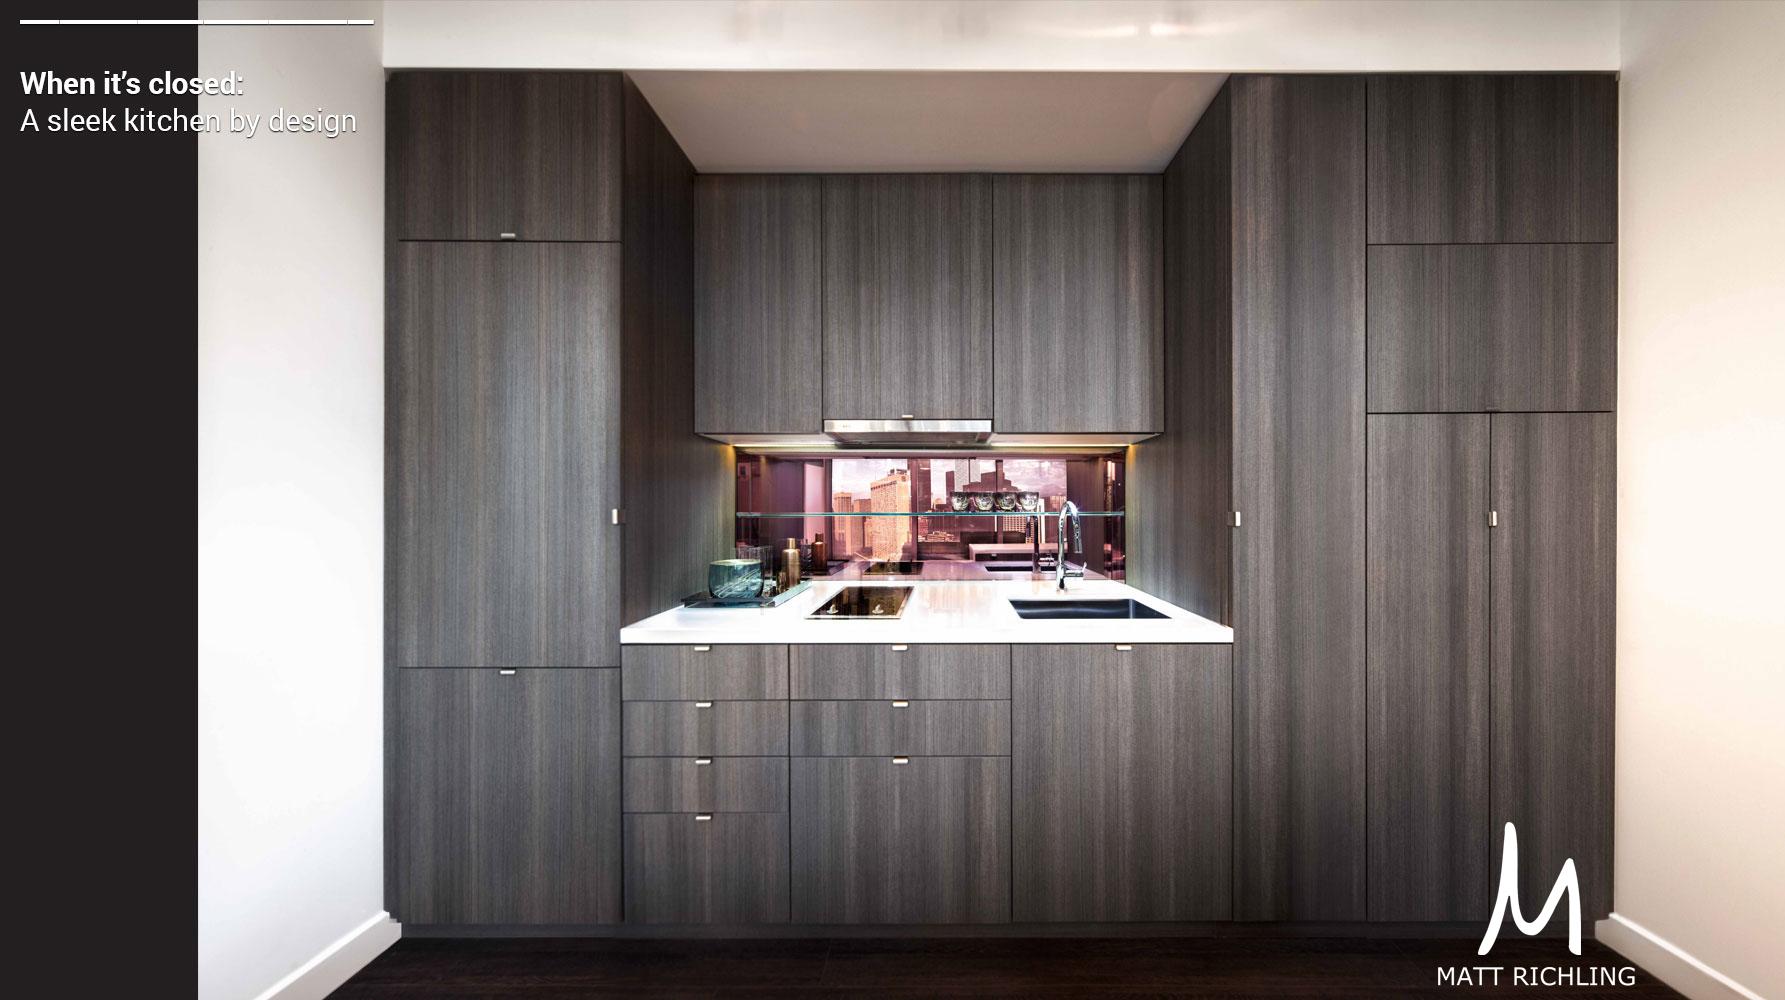 smart-kitchen-closed2.jpg